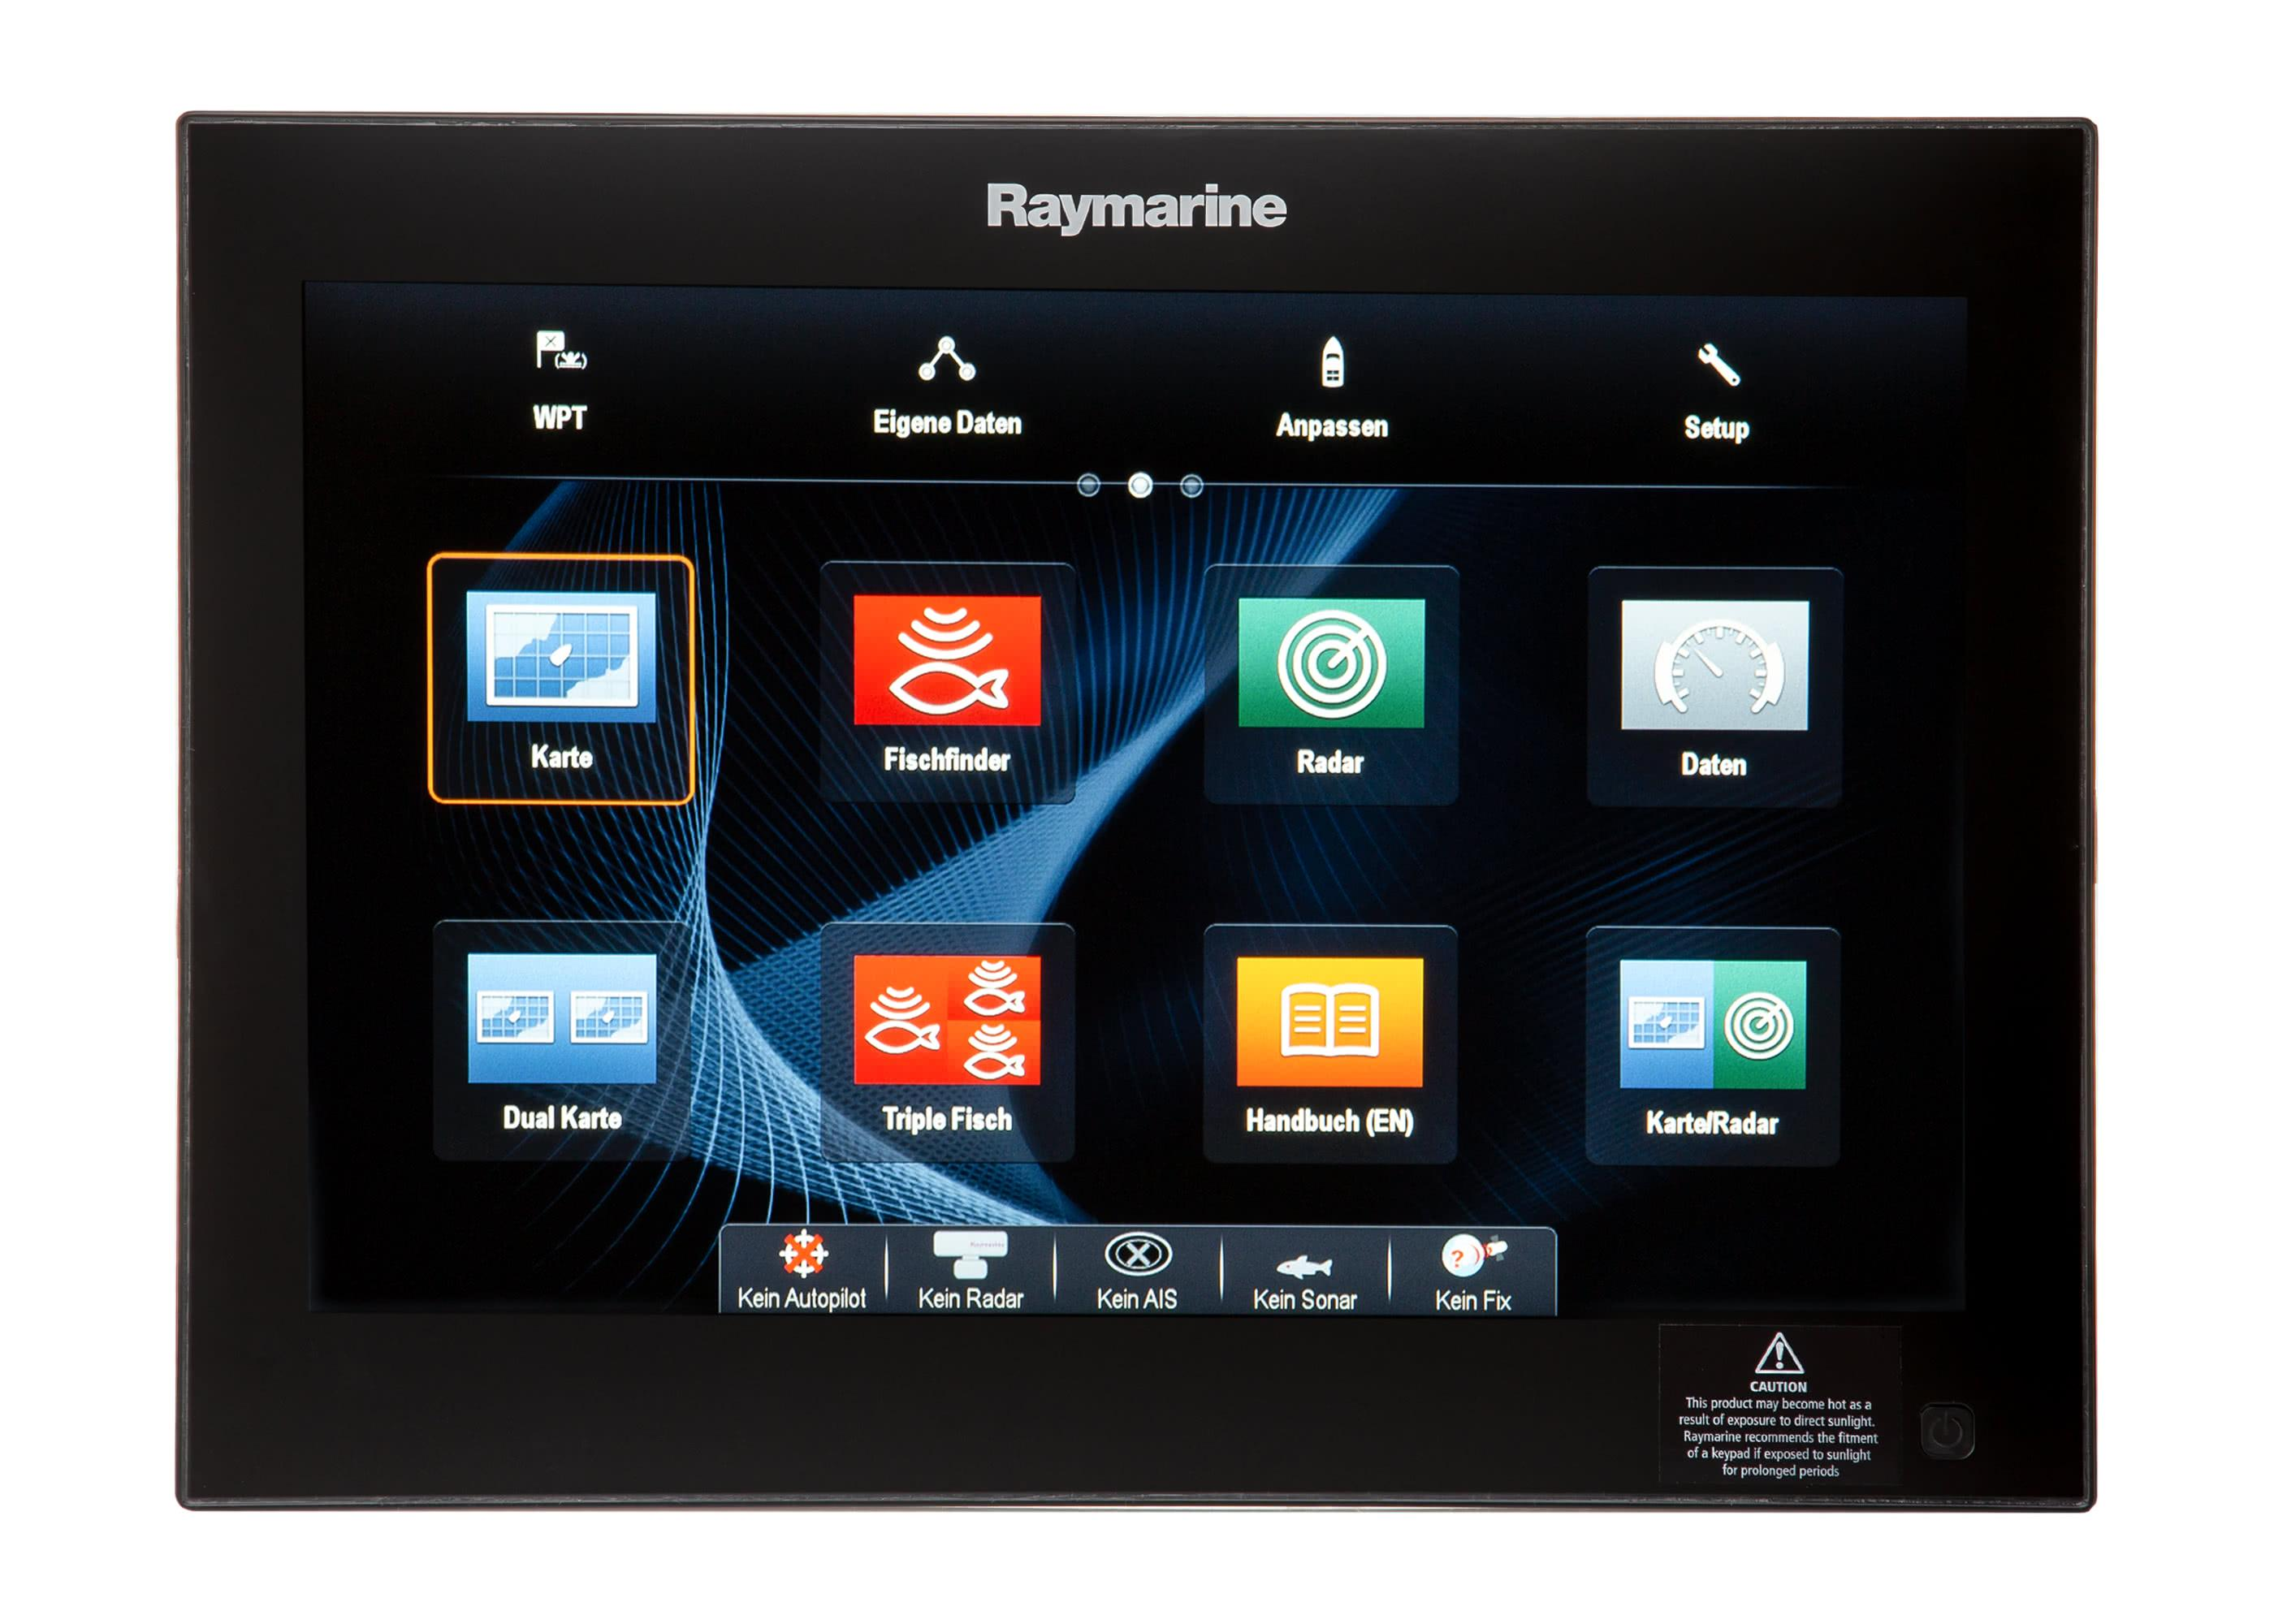 24822-Raymarine-Glass-bridge-MFD-gS165-15,4-touchscreen-4.jpg